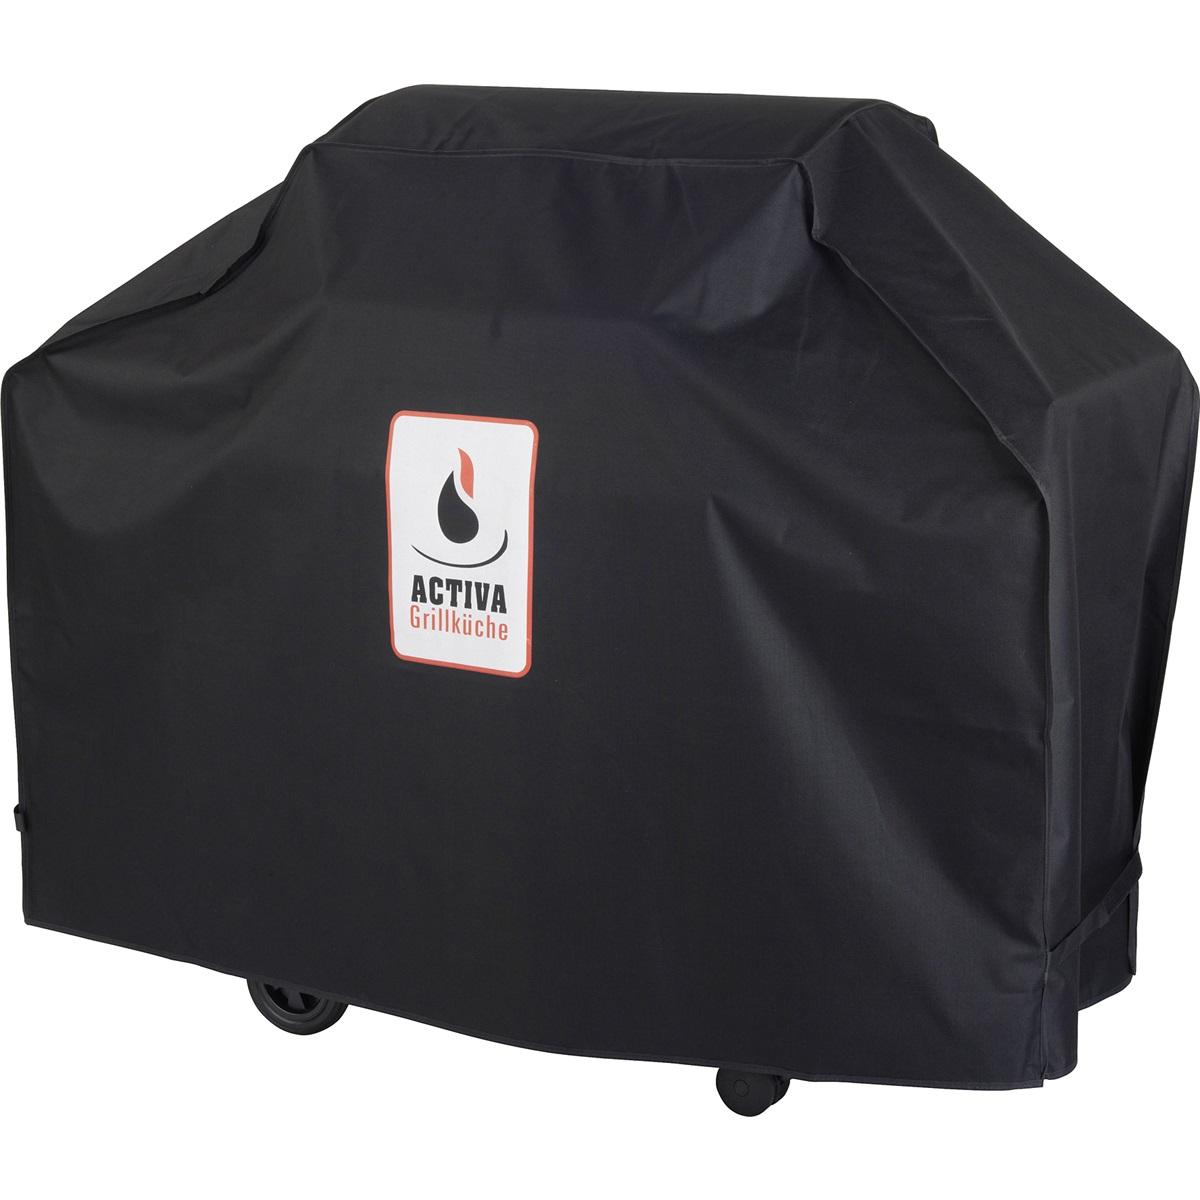 Activa ochranný obal na gril Premium L